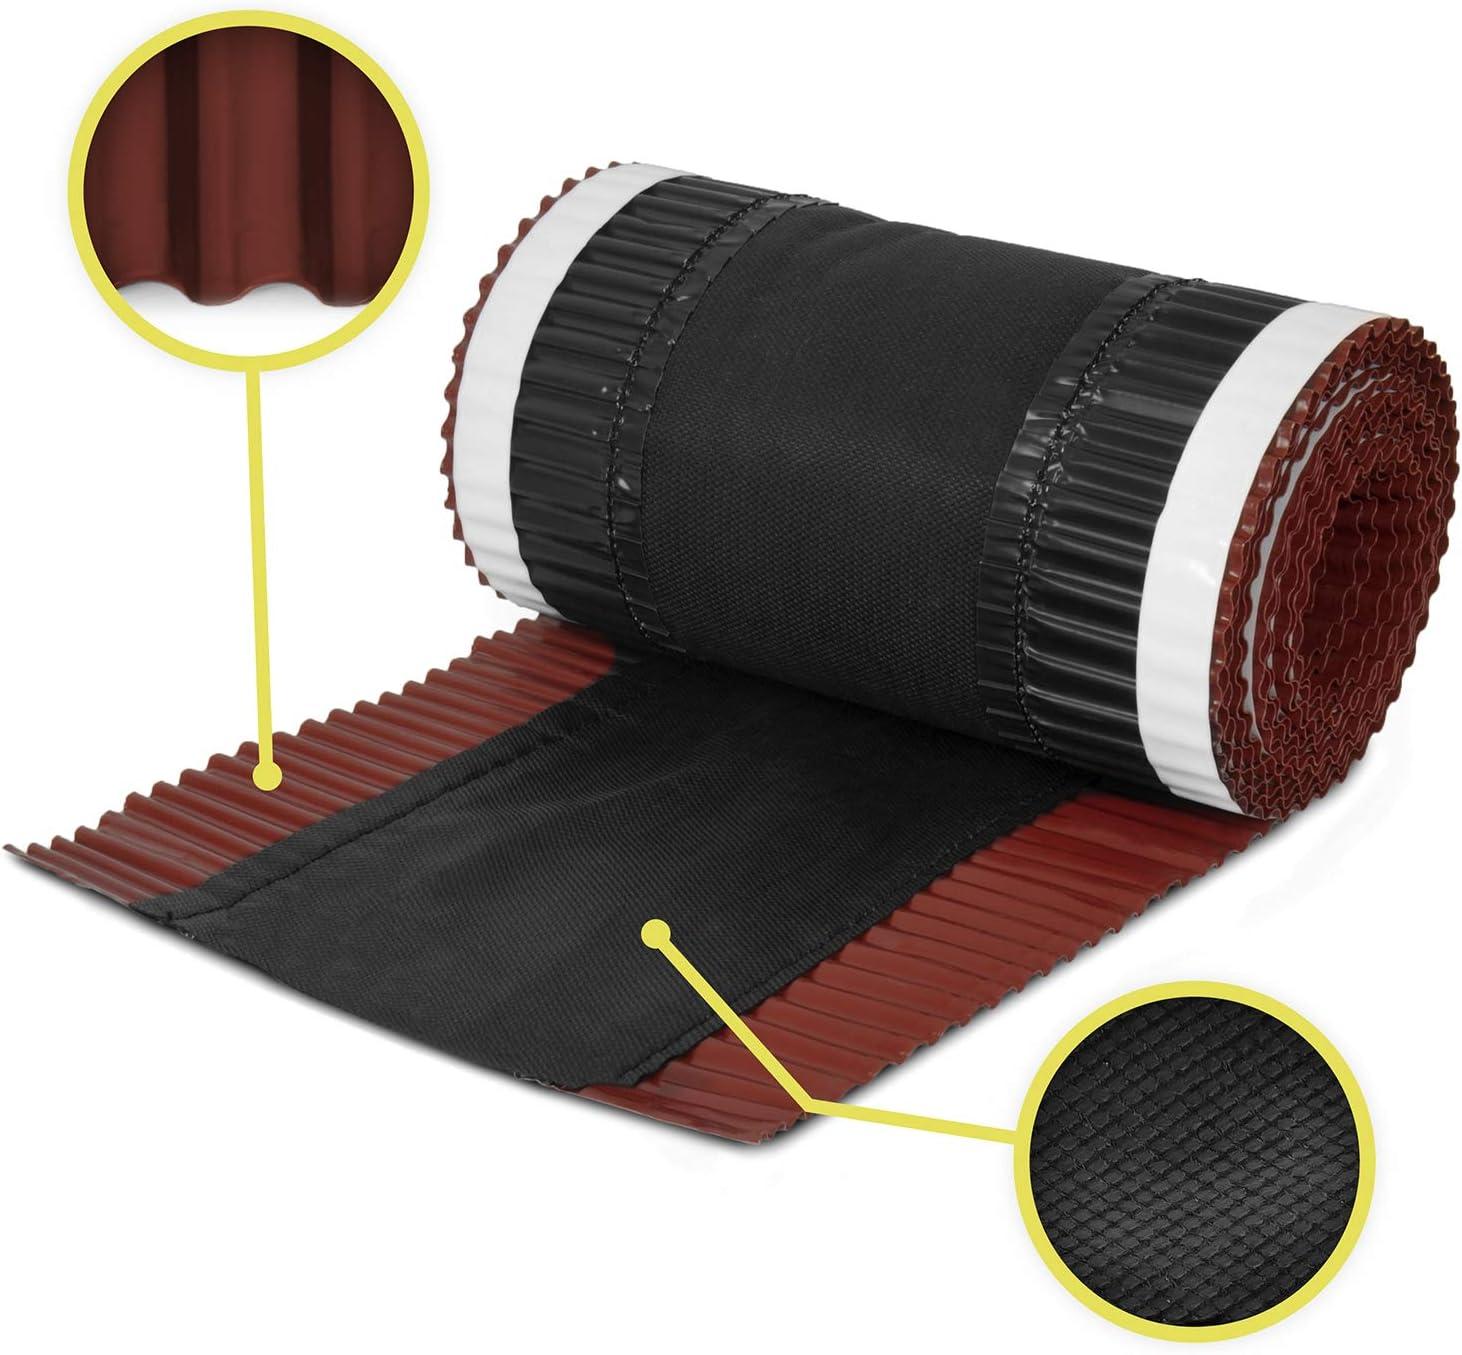 5m x 240mm Brun chocolat closoir ventil/é RAL 8017